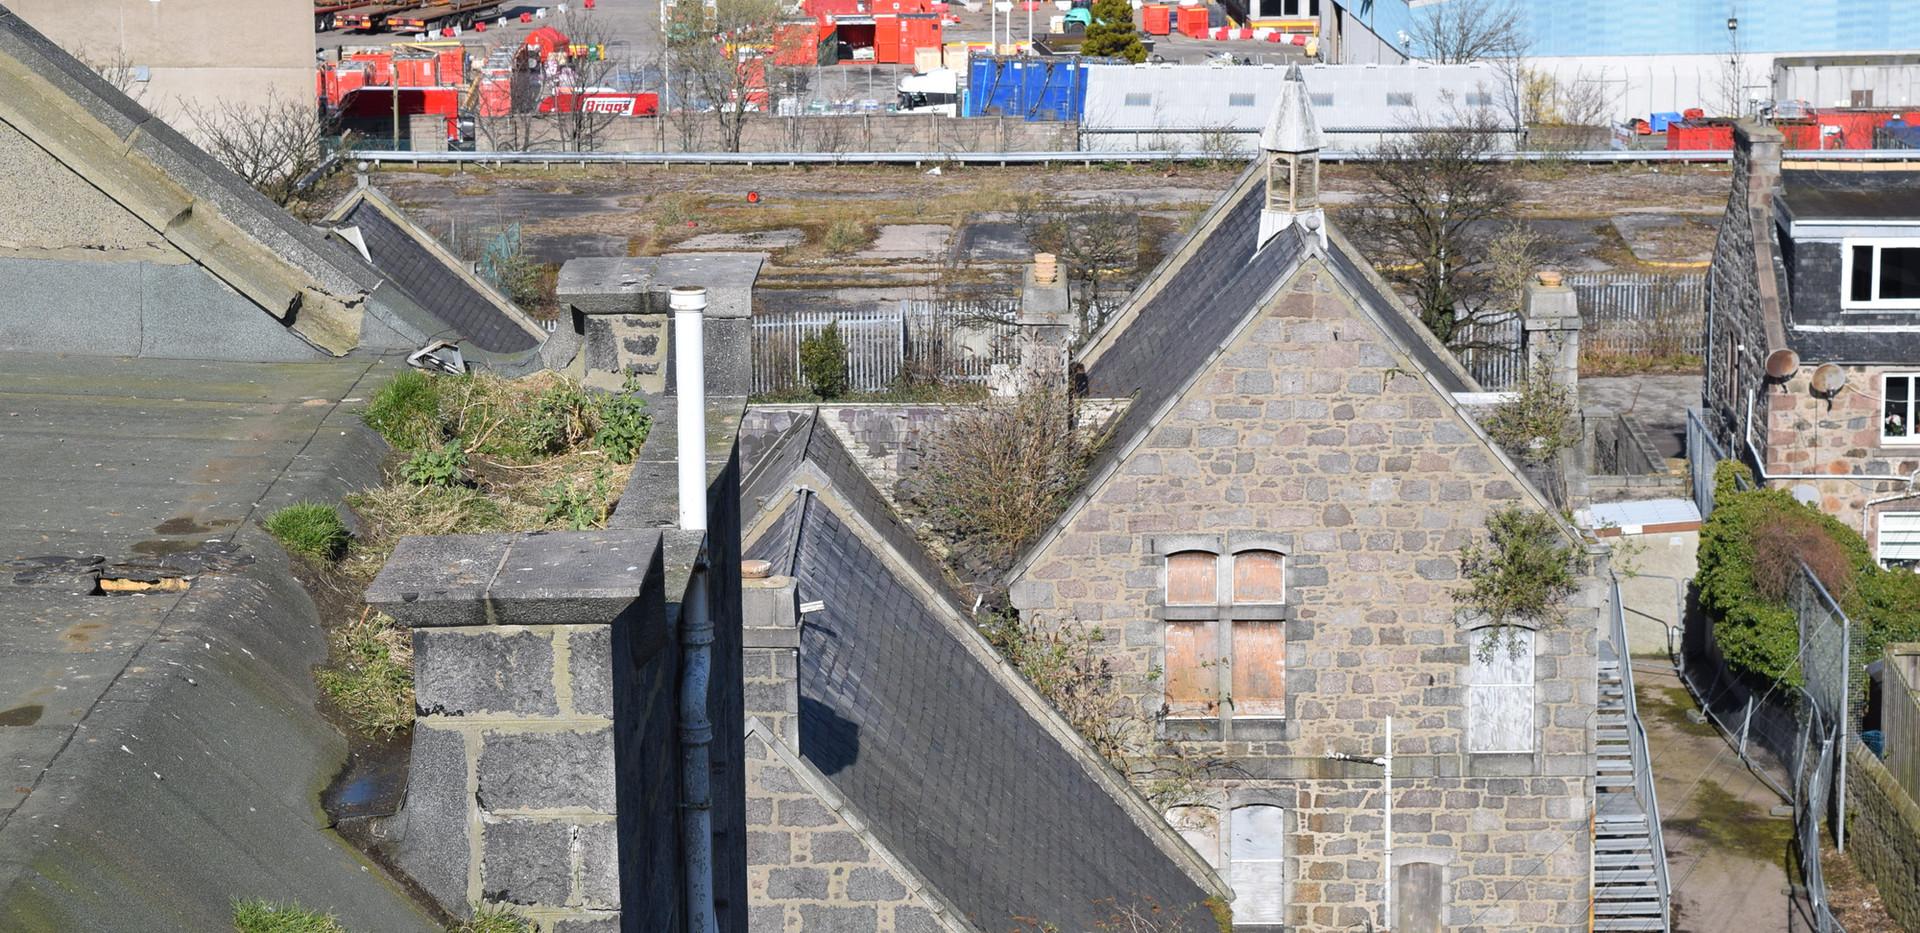 Rooftops of the Victoria Road School buildings